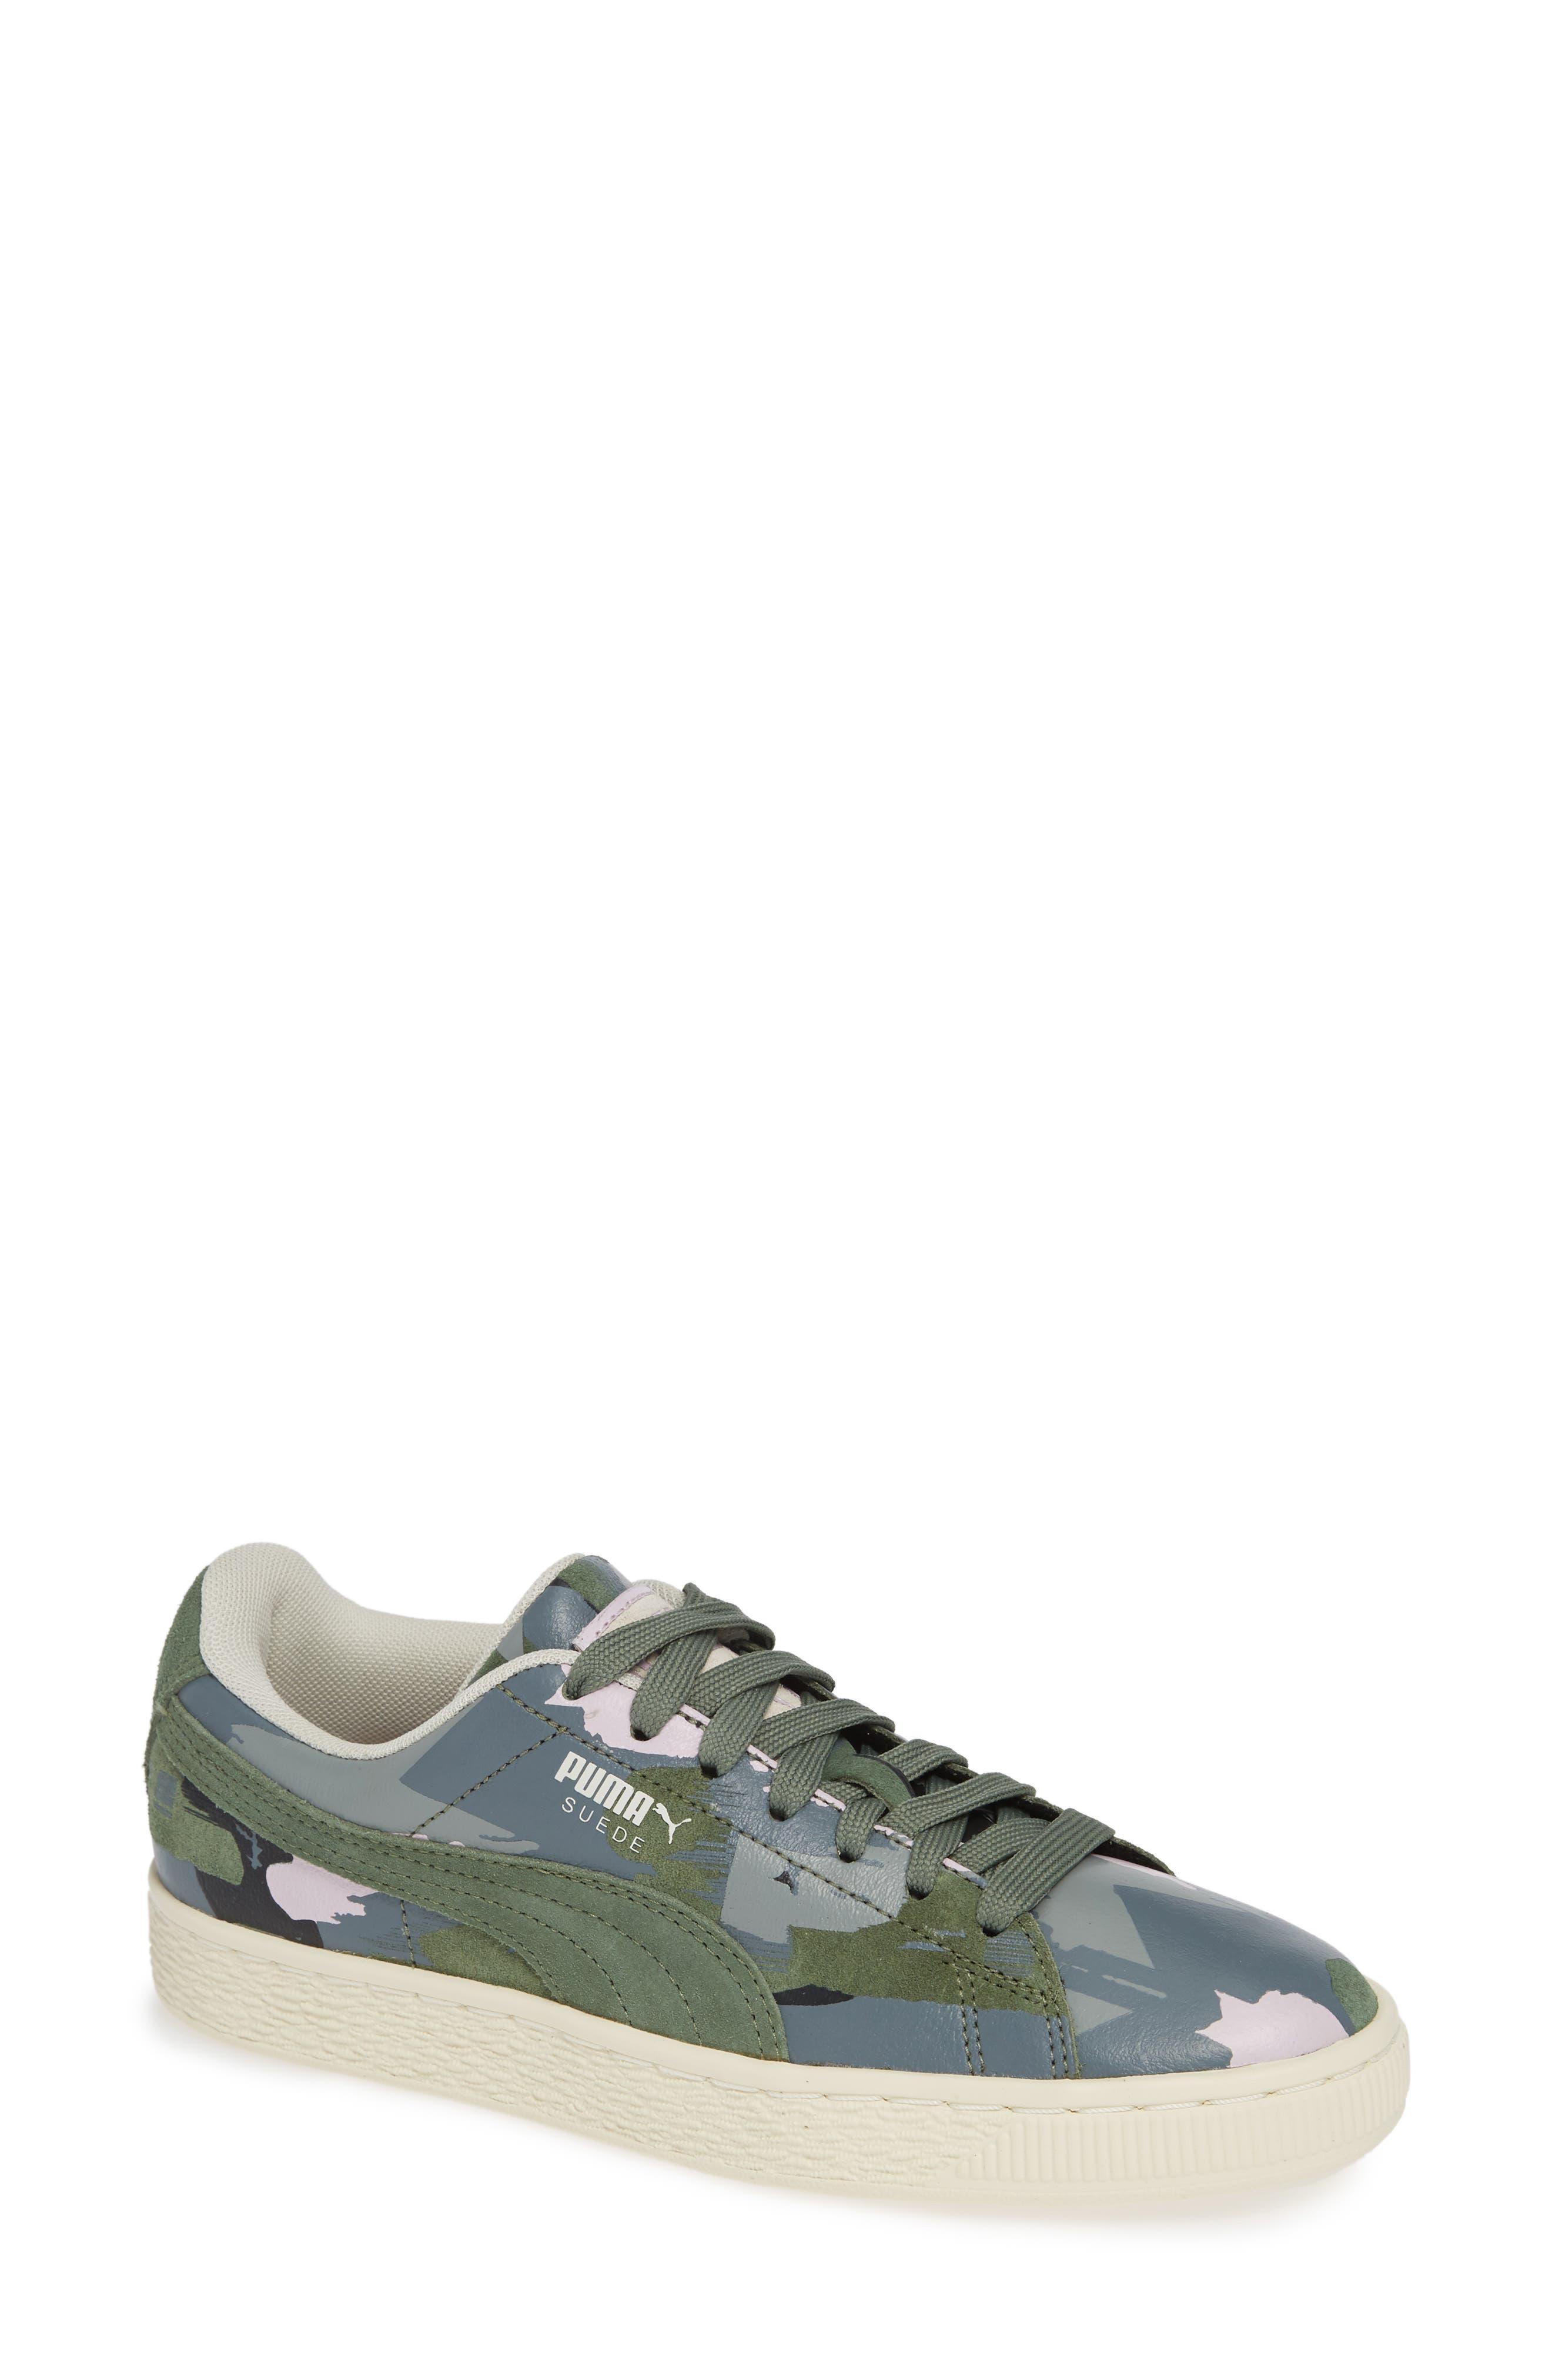 'Suede Classic' Sneaker,                             Main thumbnail 1, color,                             Laurel Wreath-White-Orchid